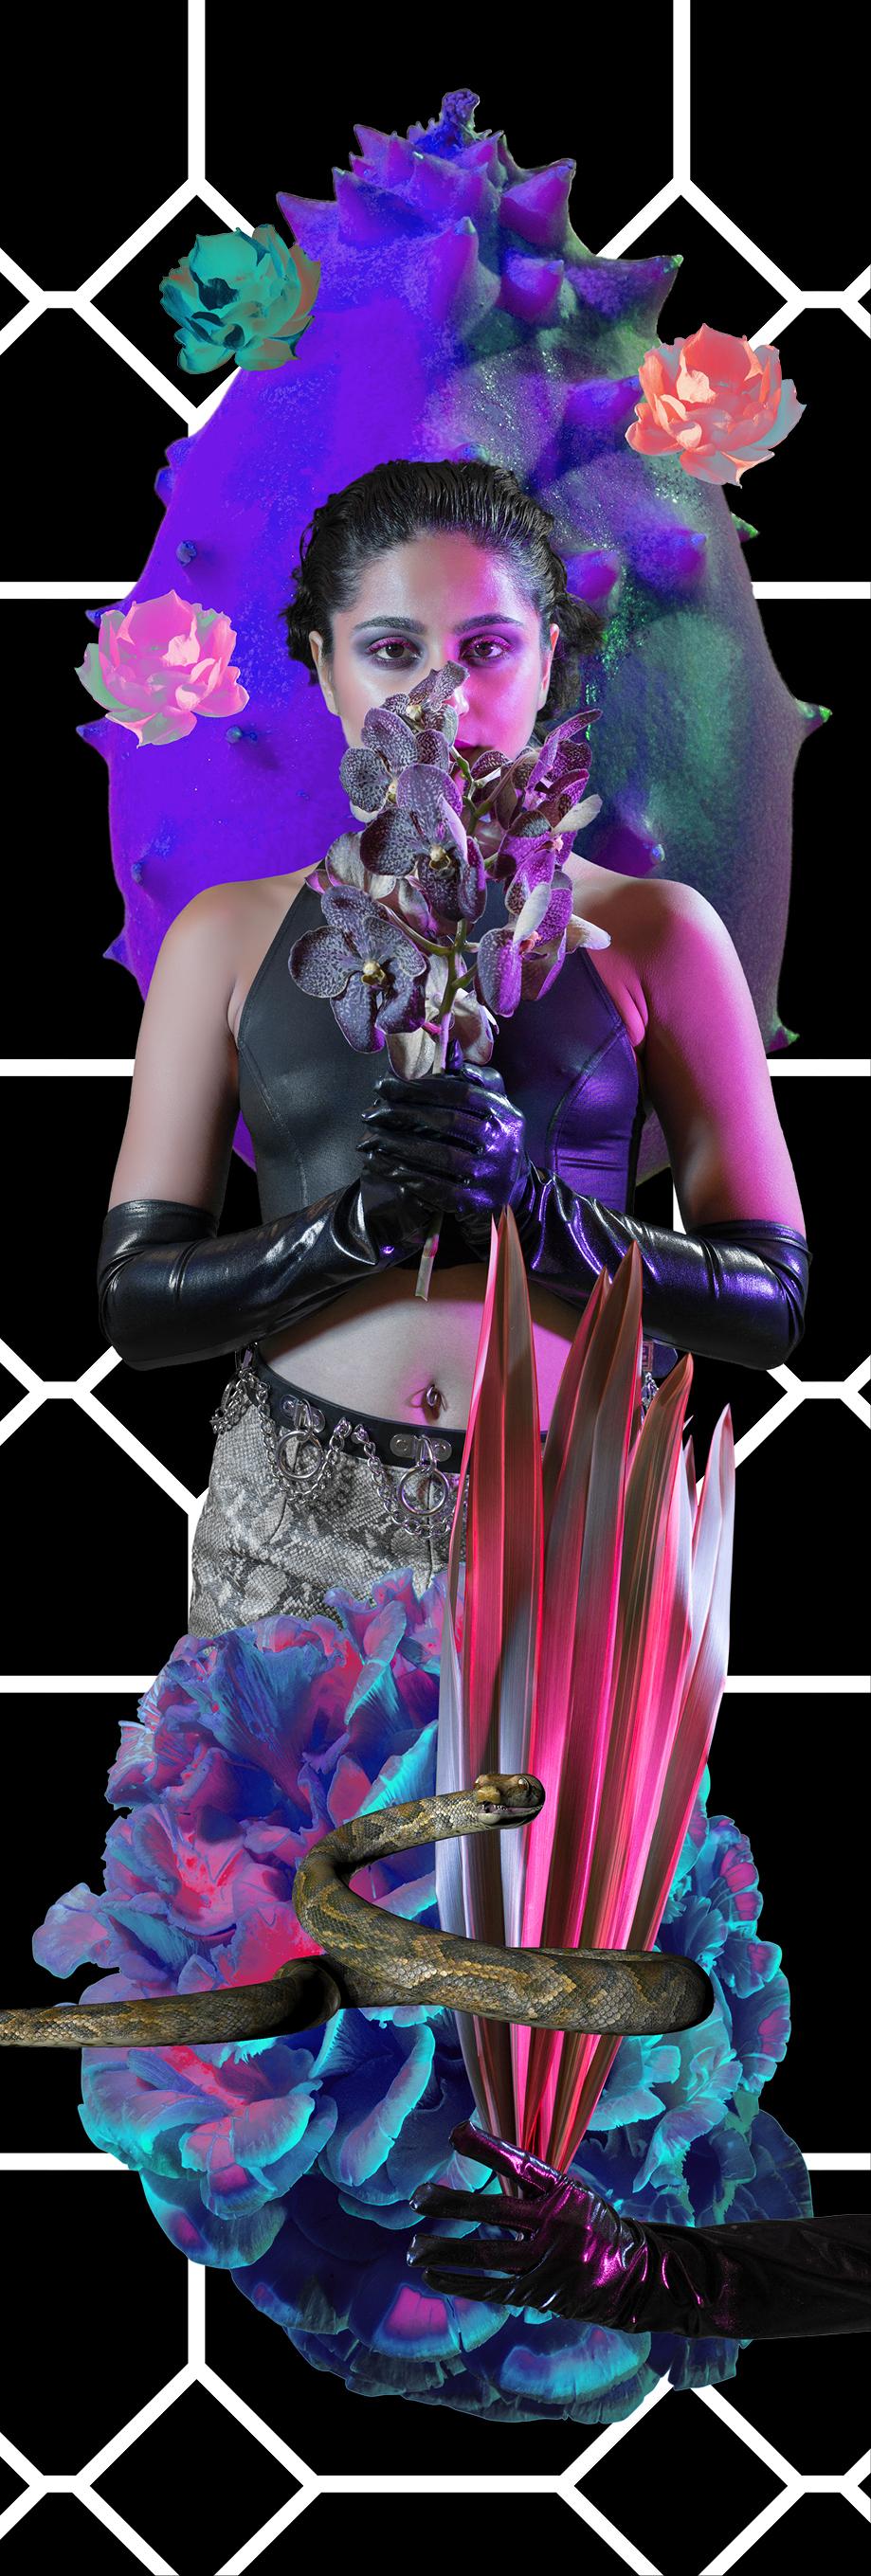 Biochromatic11_essentials_creative_fabian_villa.jpg